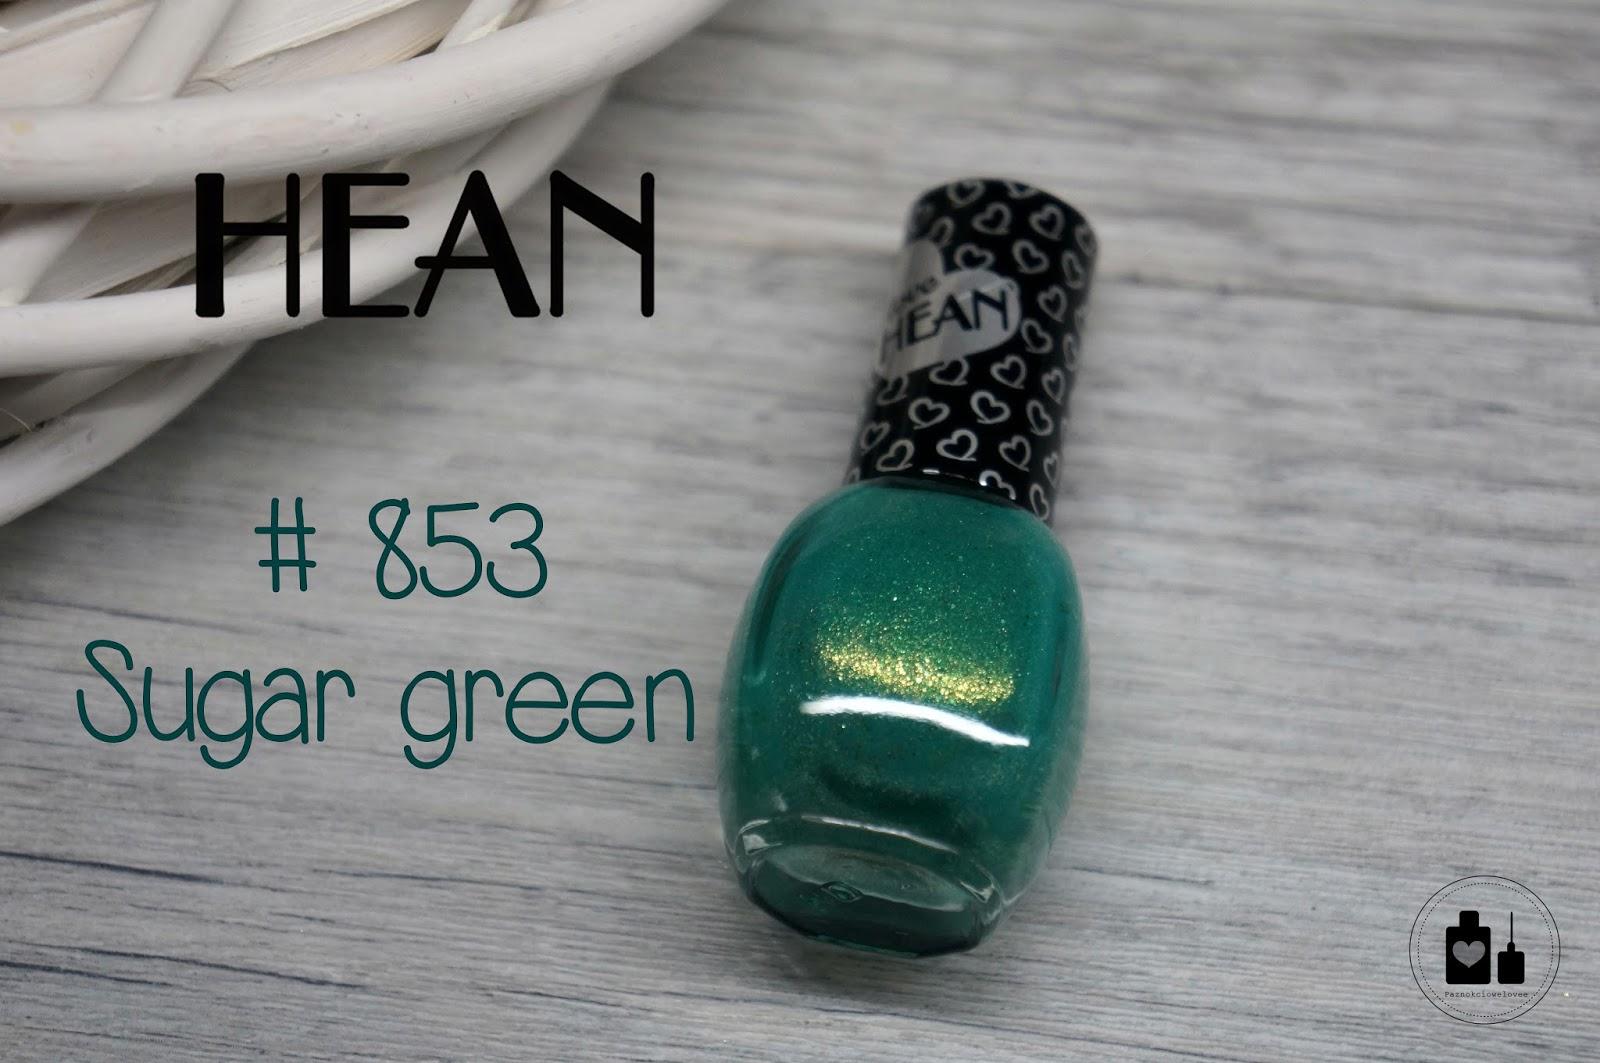 "Hean, 853 Sugar green, czyli cukrowa ""zieloność""."